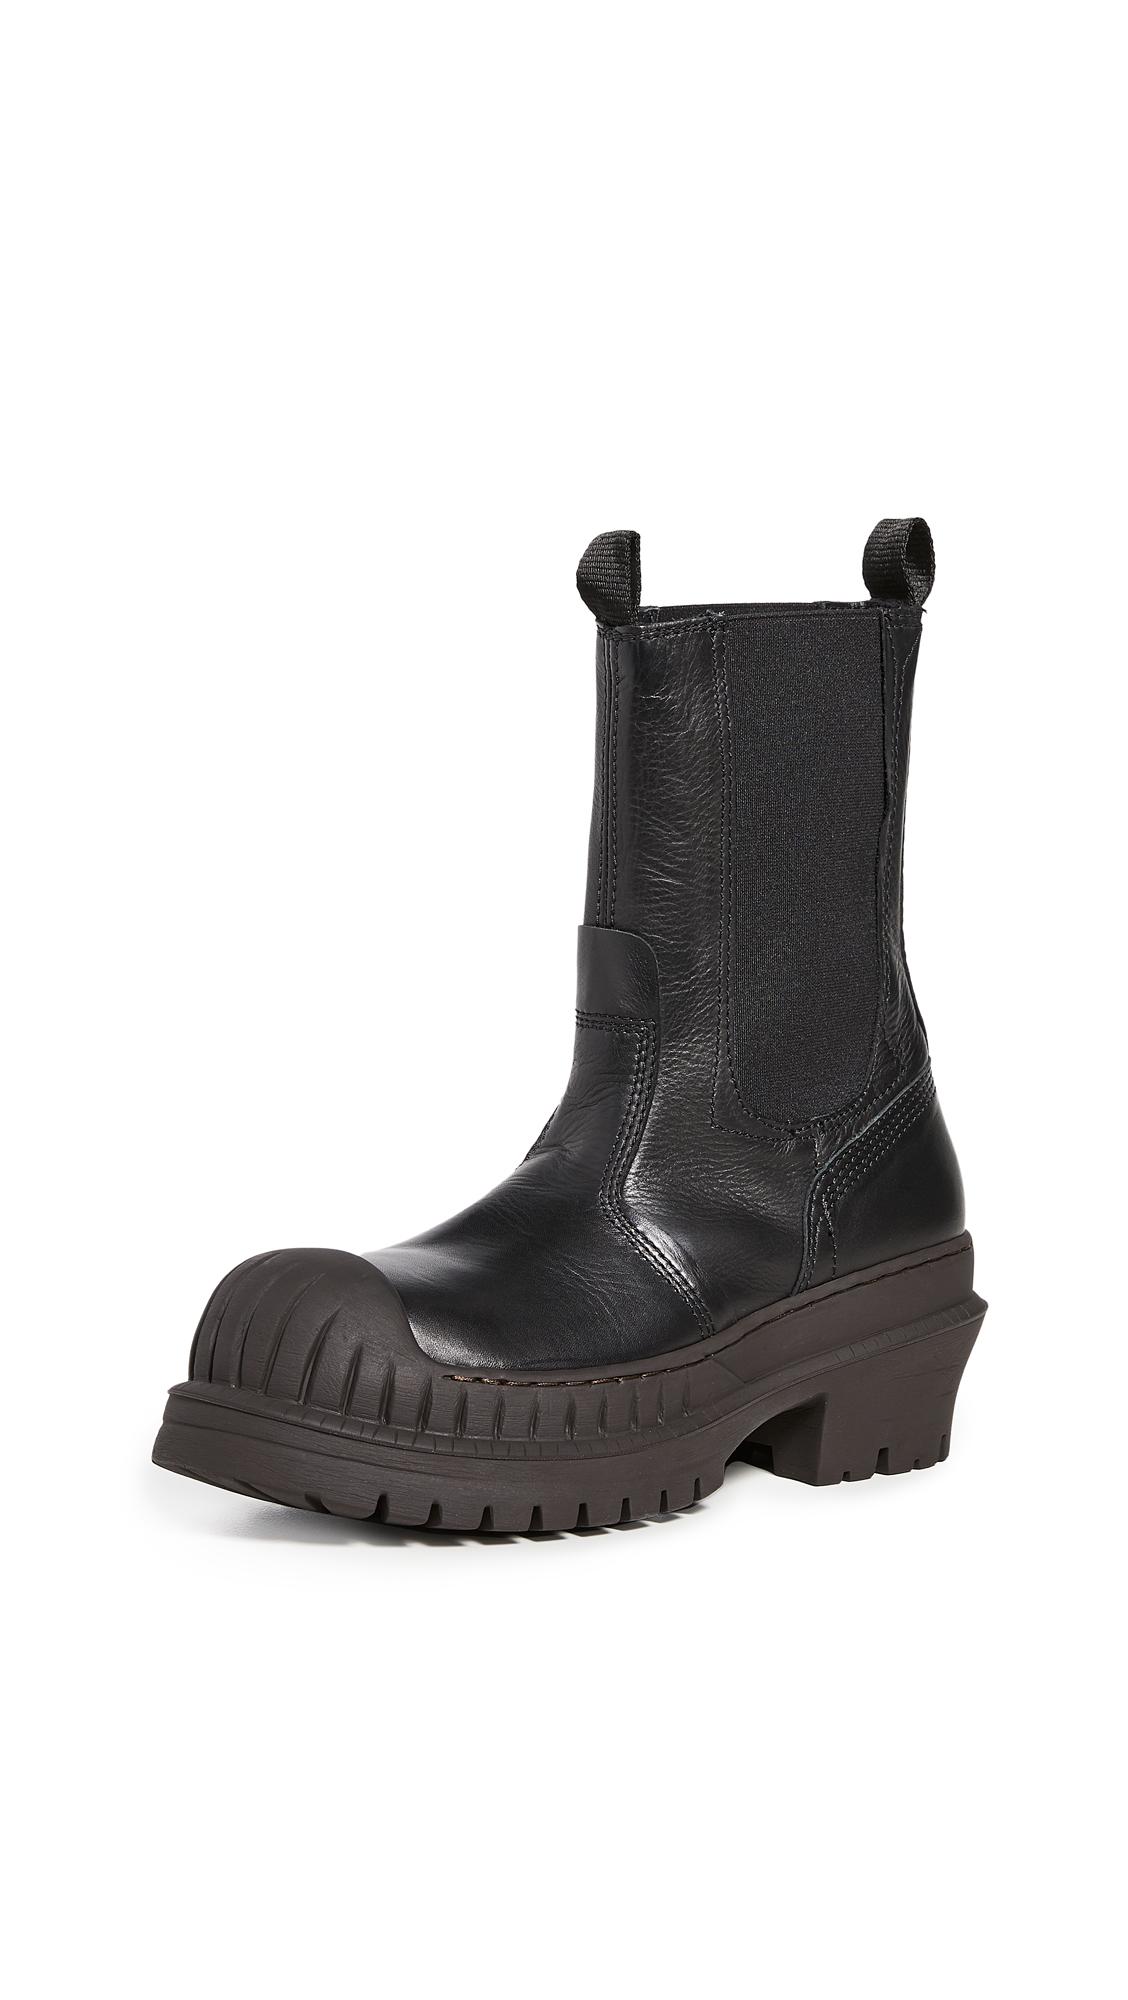 Acne Studios Bryant Chelsea Boots